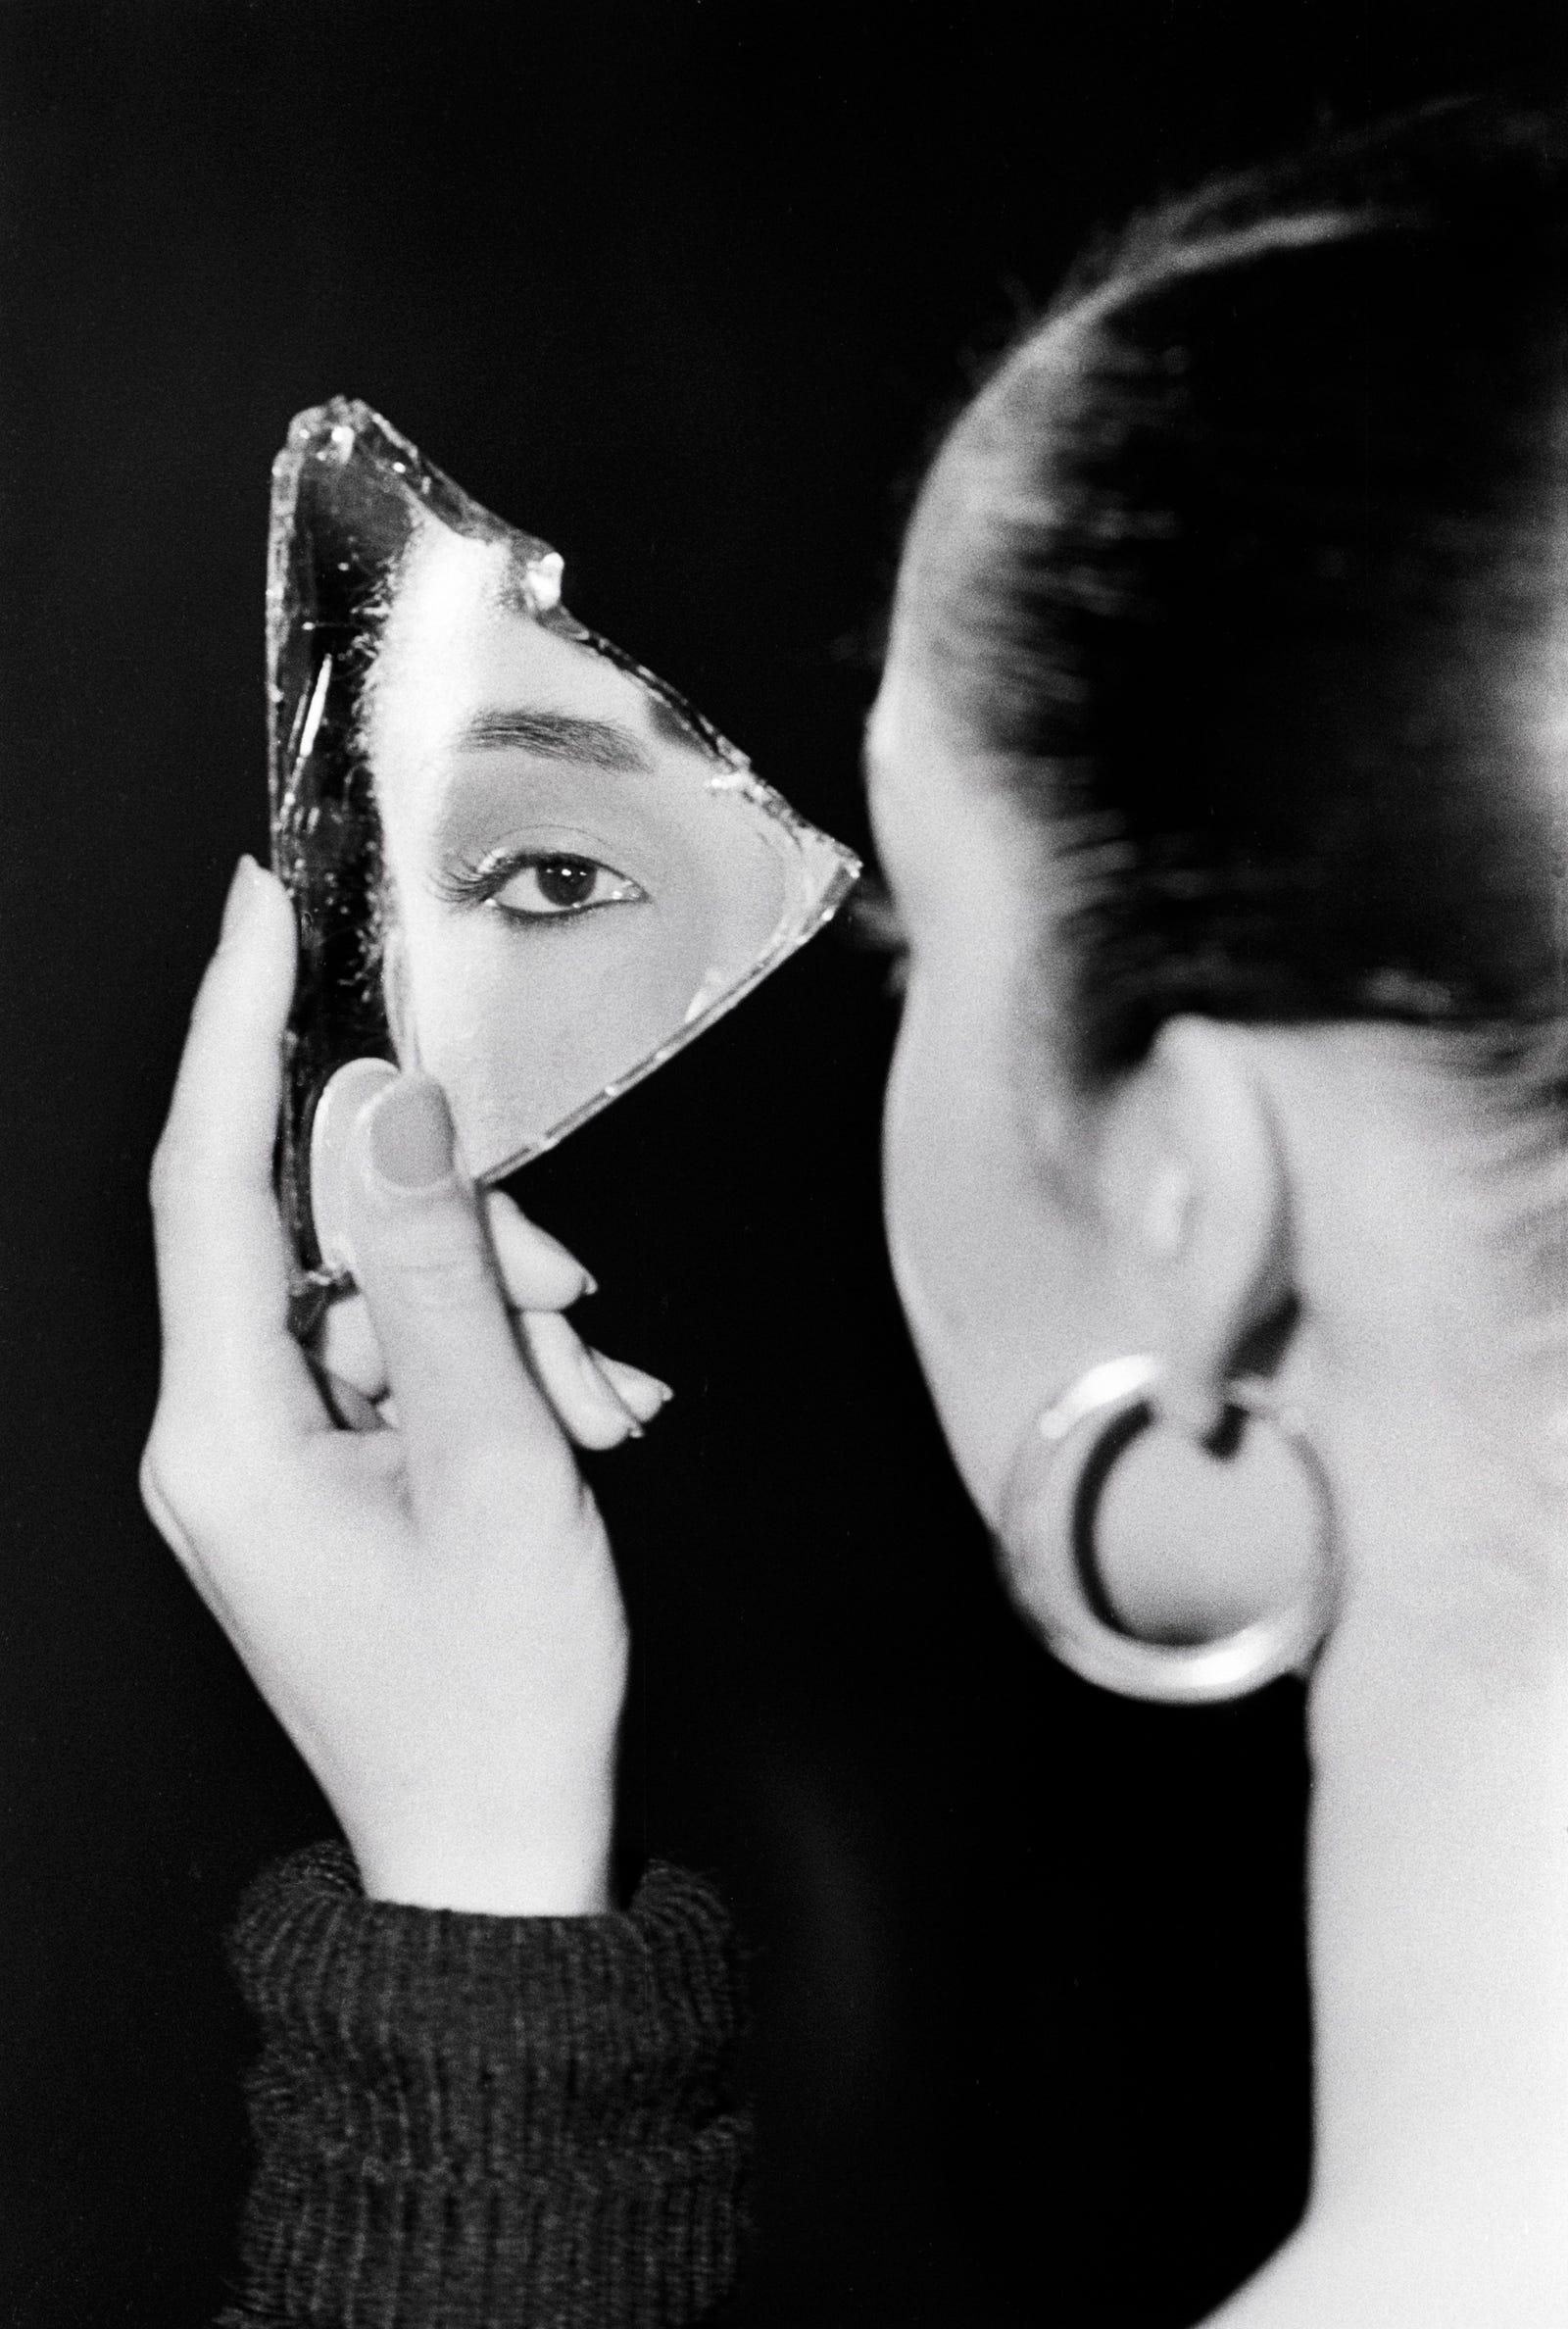 Sade in mirror 1983.